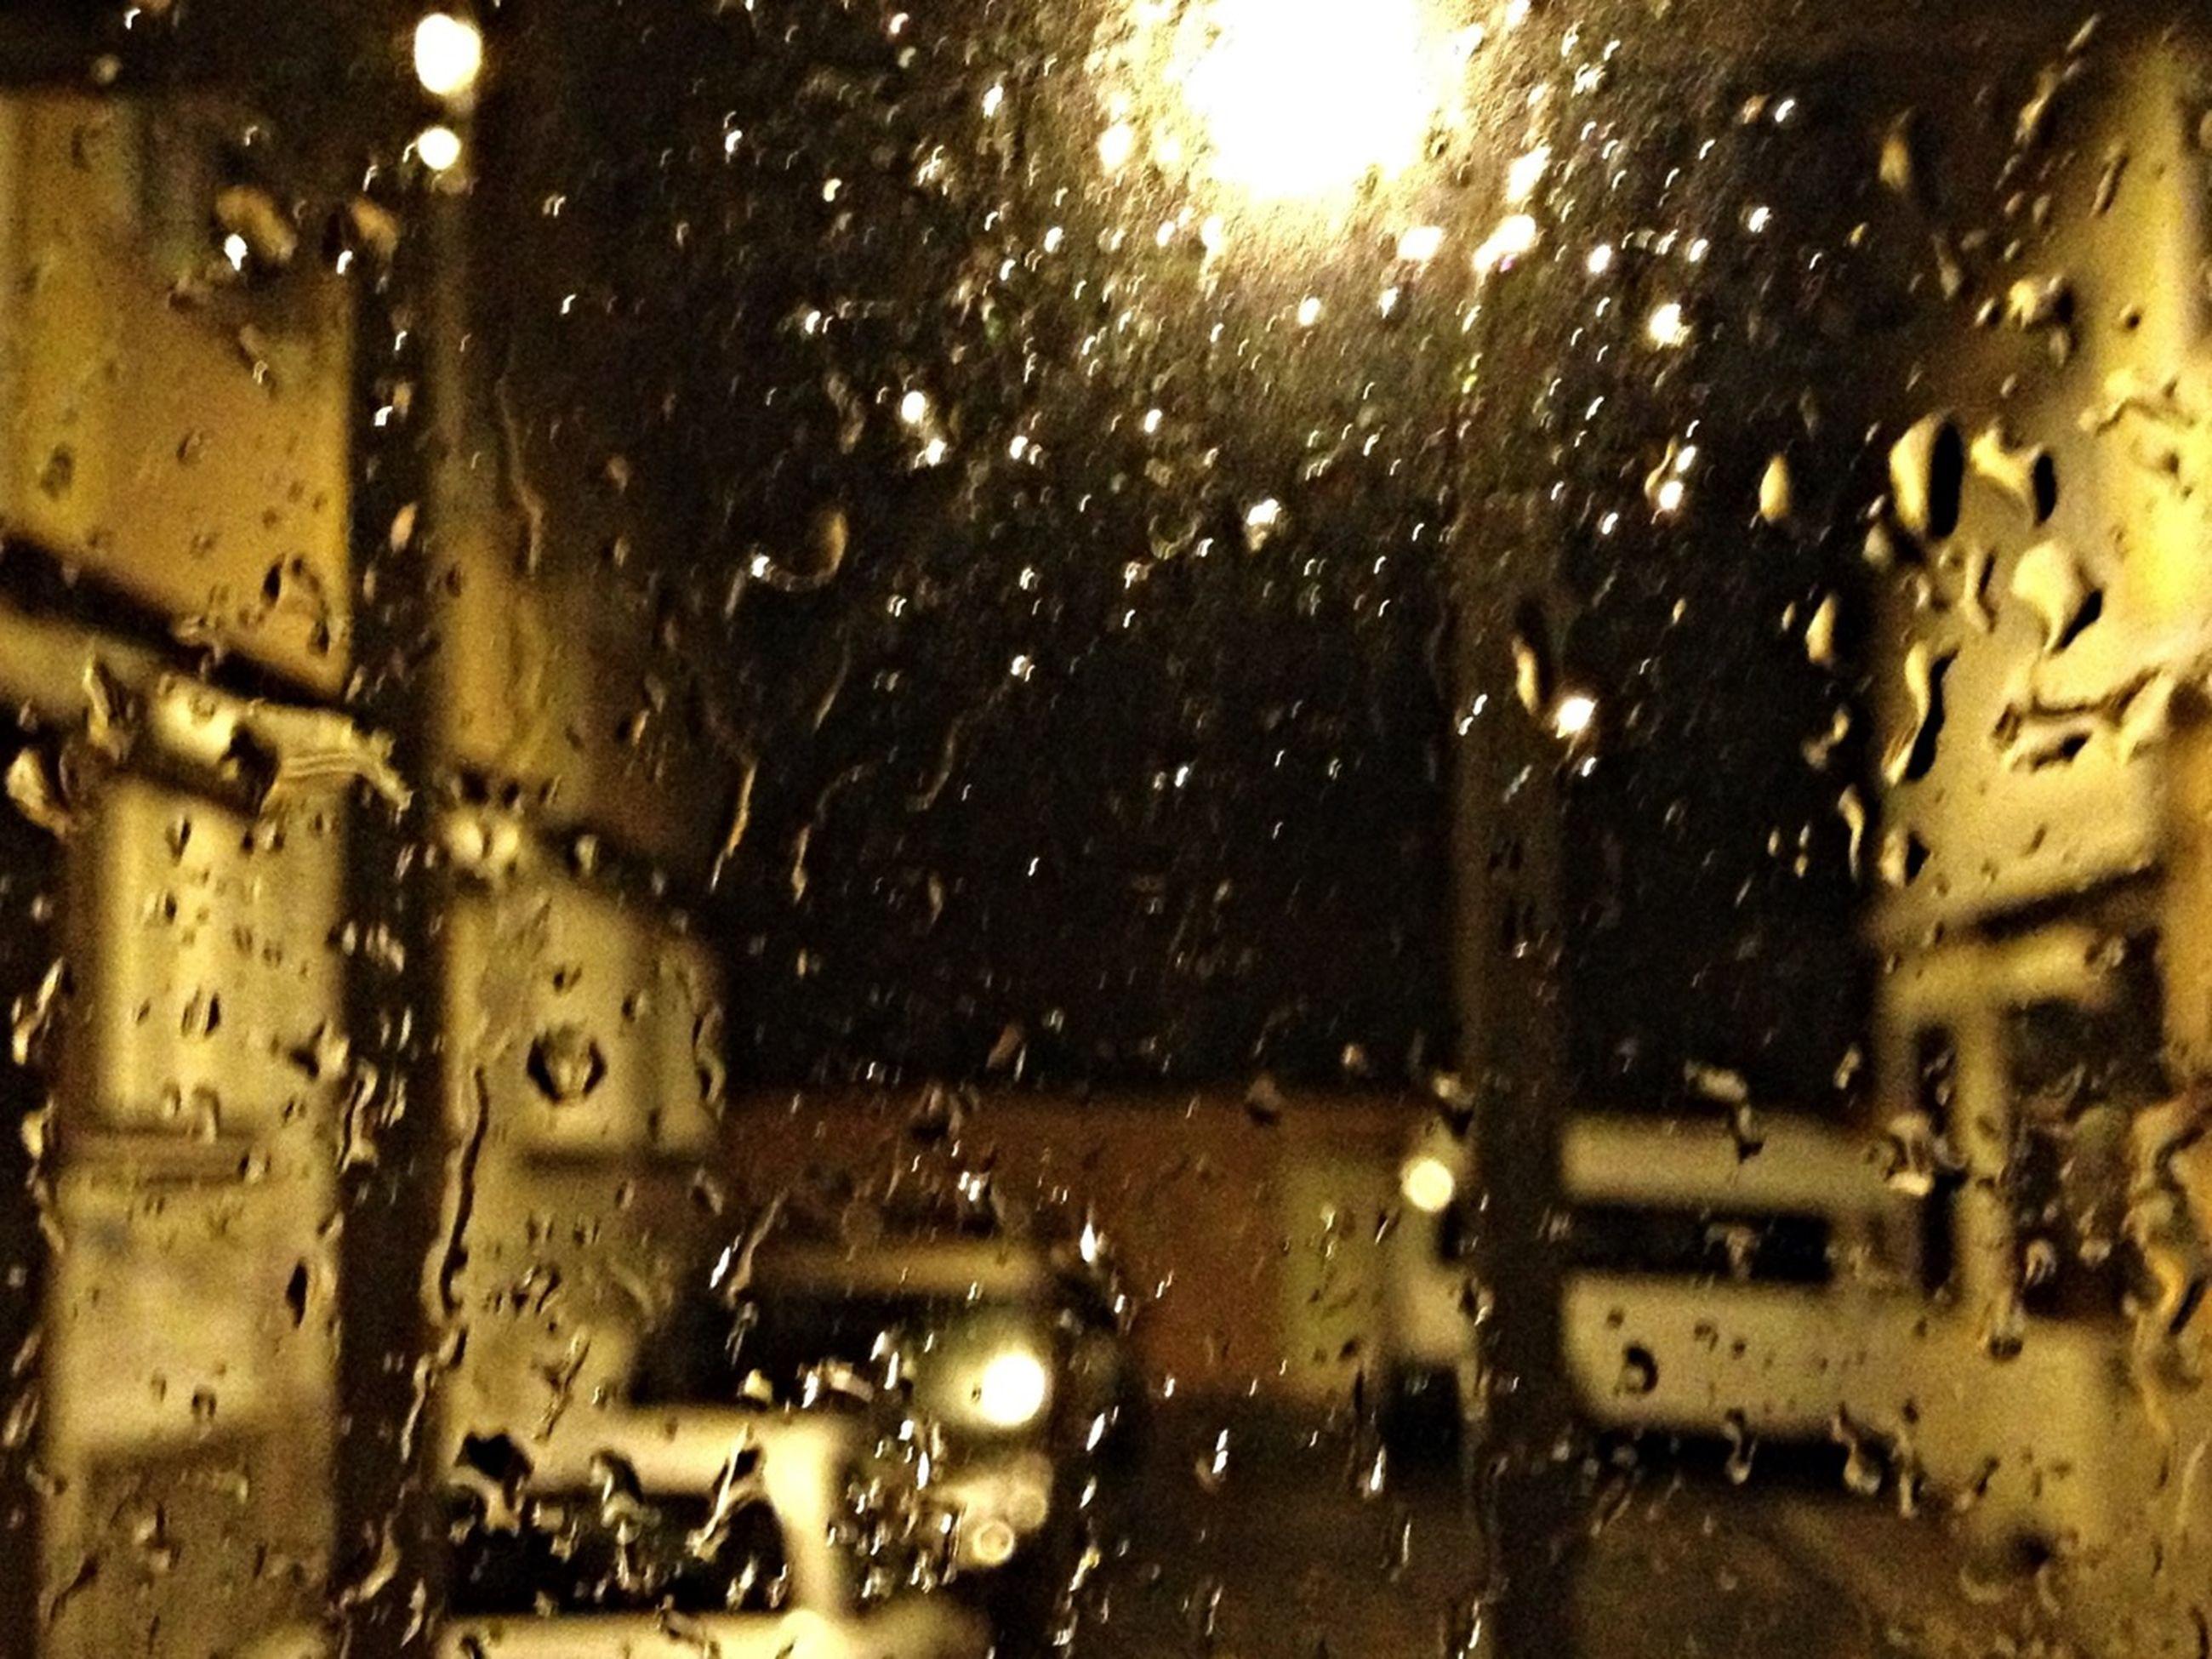 wet, drop, window, rain, indoors, transparent, glass - material, water, season, raindrop, weather, car, focus on foreground, full frame, glass, transportation, close-up, vehicle interior, monsoon, land vehicle